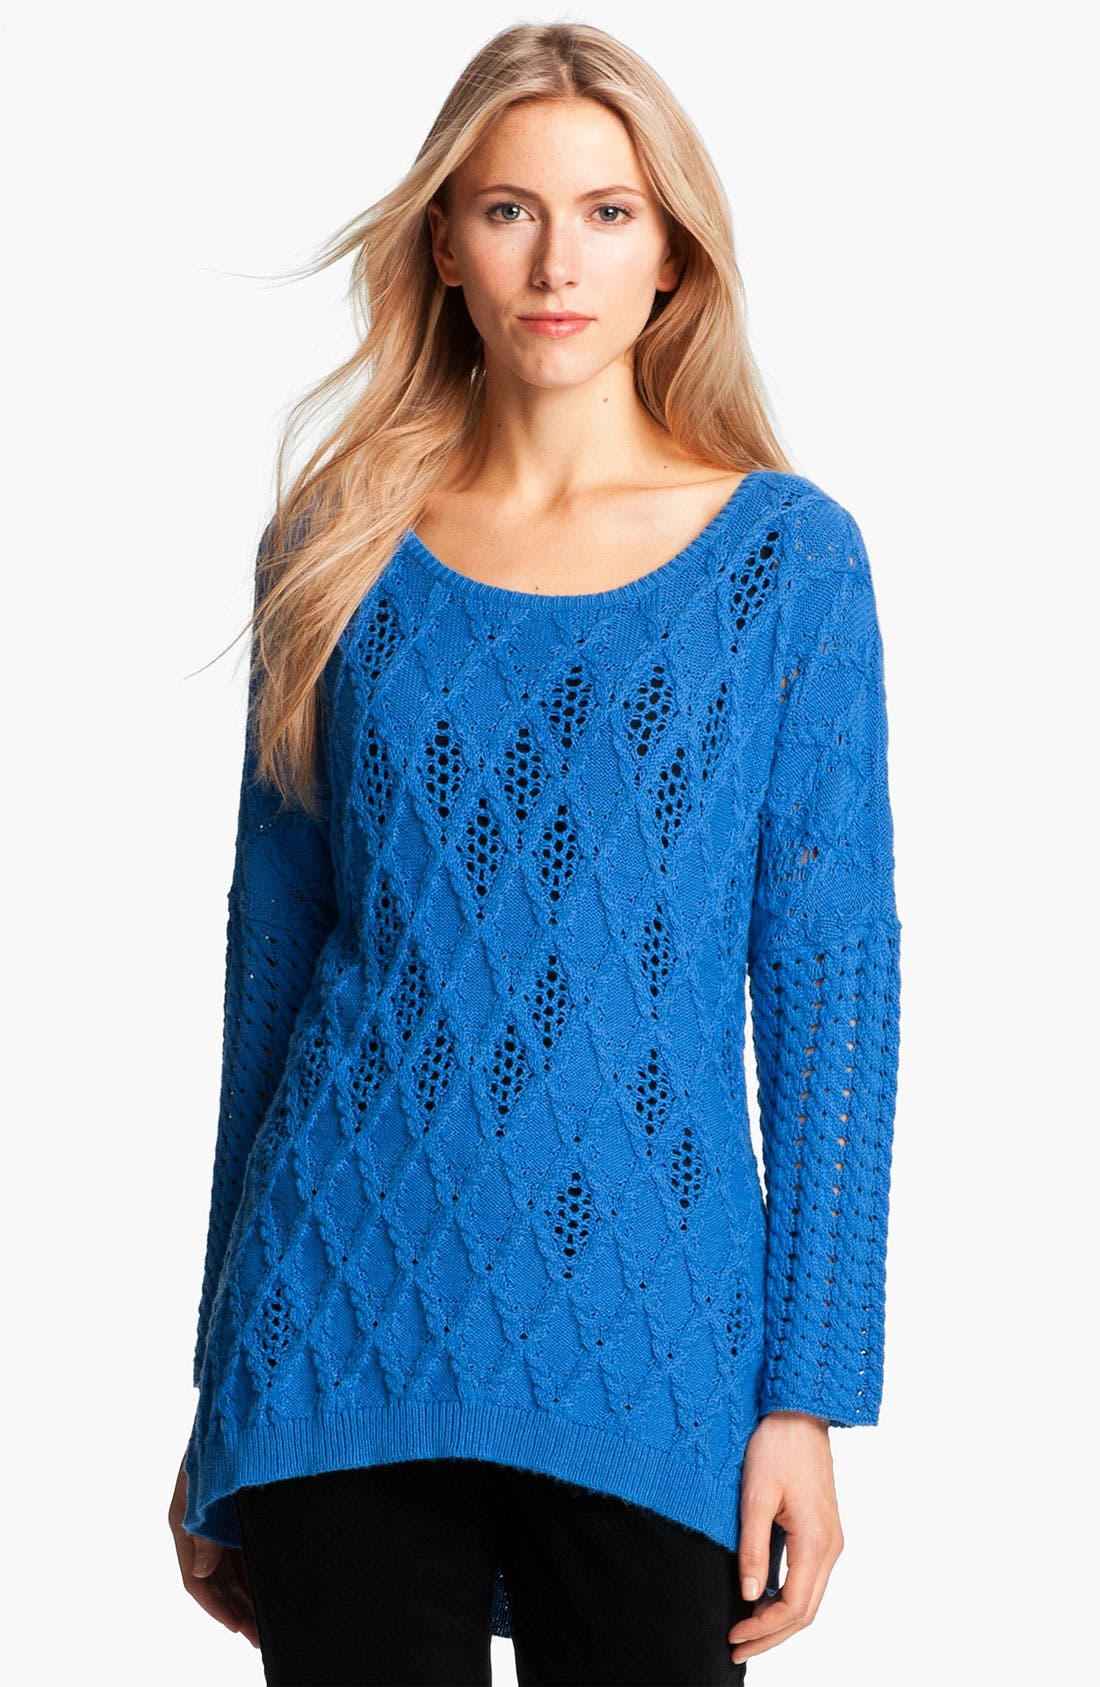 Alternate Image 1 Selected - Nic + Zoe Bateau Neck Mix Knit Sweater